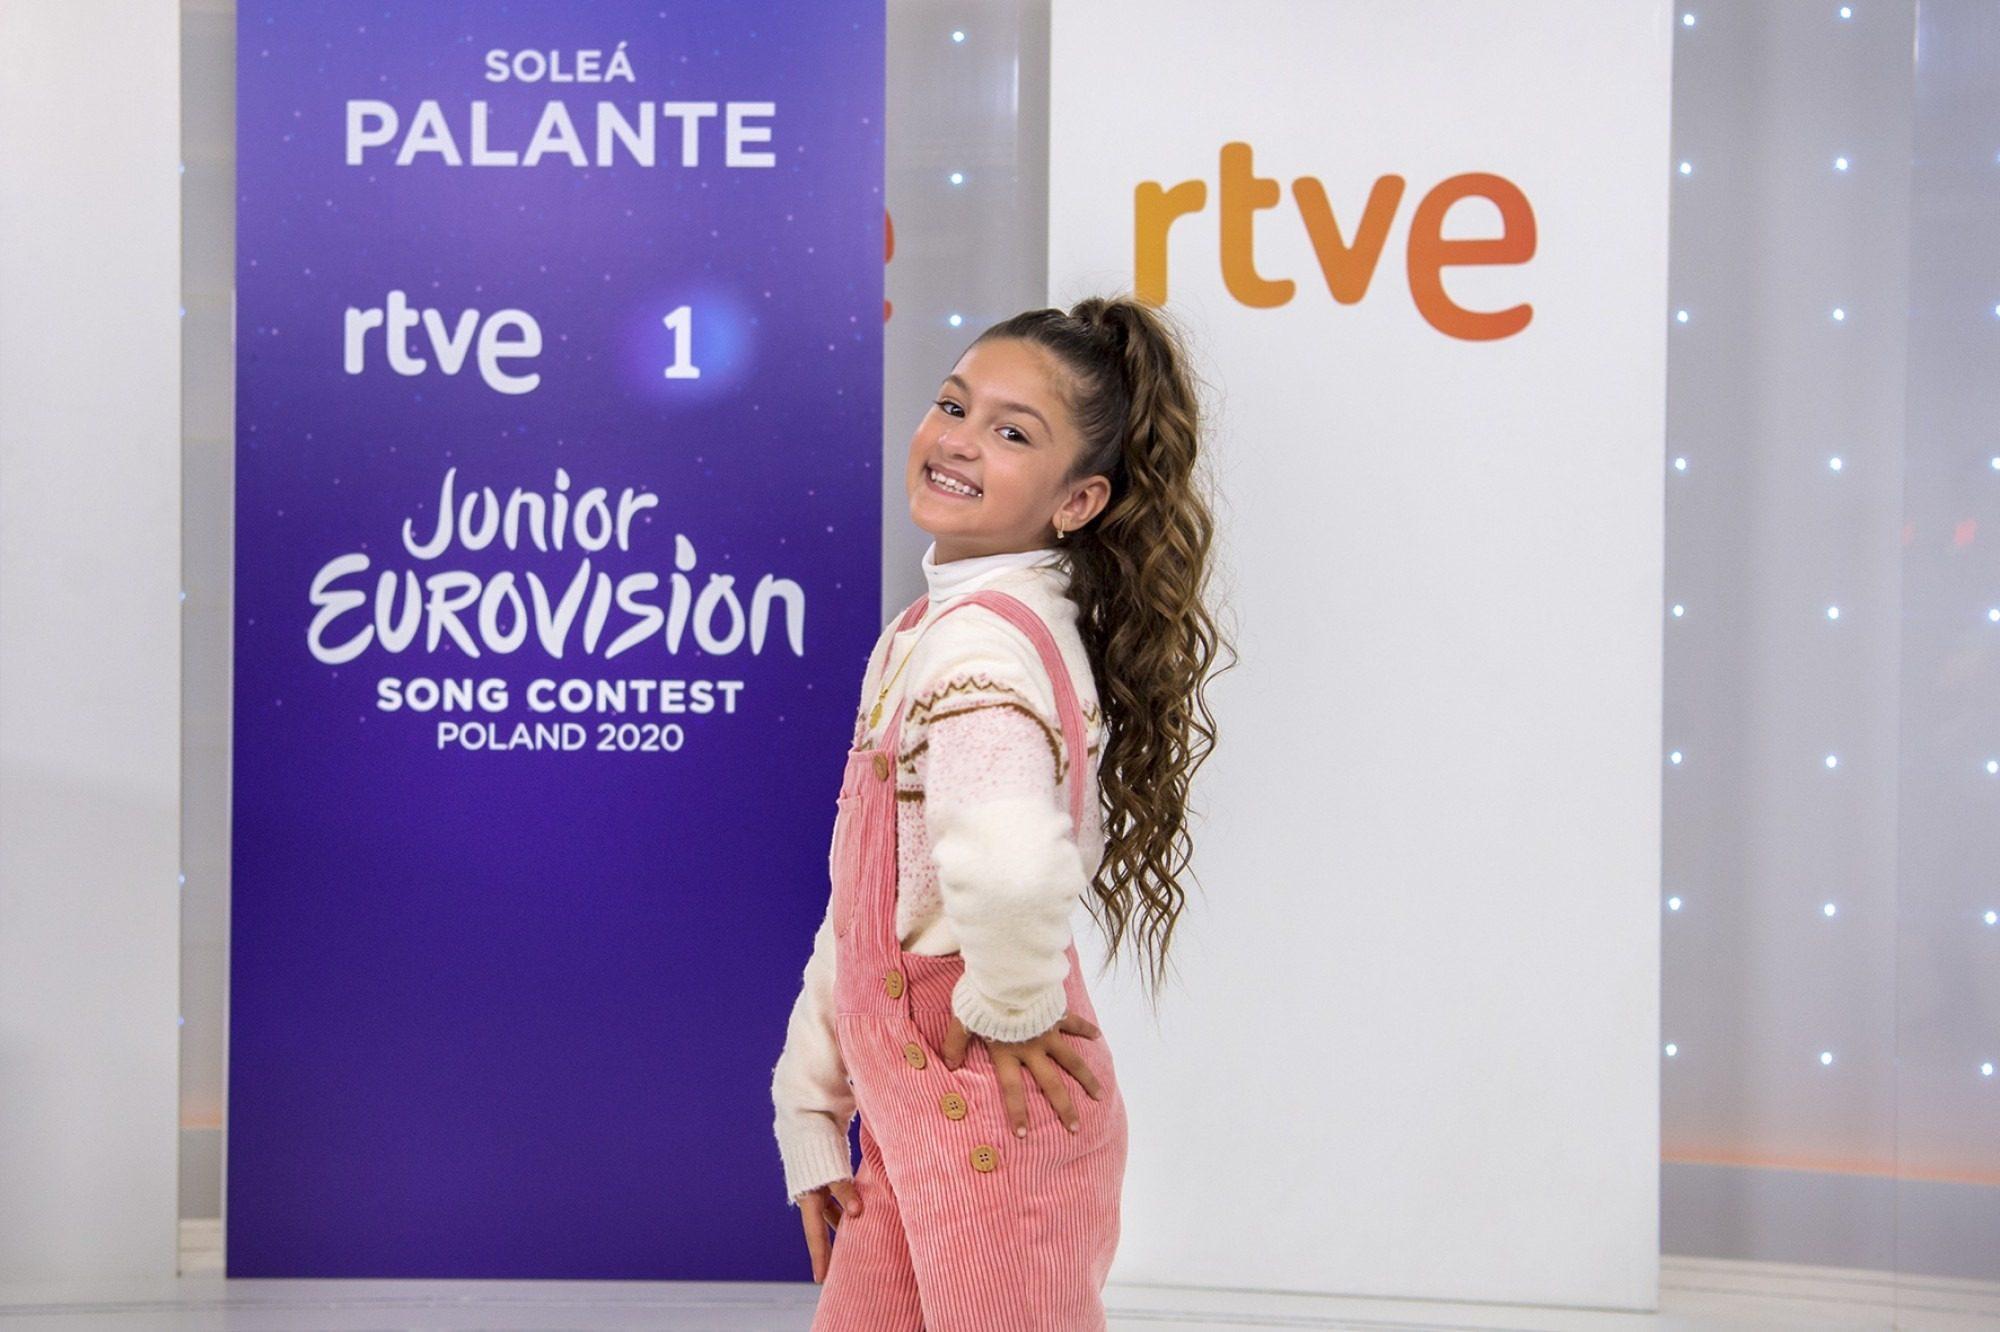 27112020_070652_EurovisionJunior_Solea_parentesis3parentesis_grande